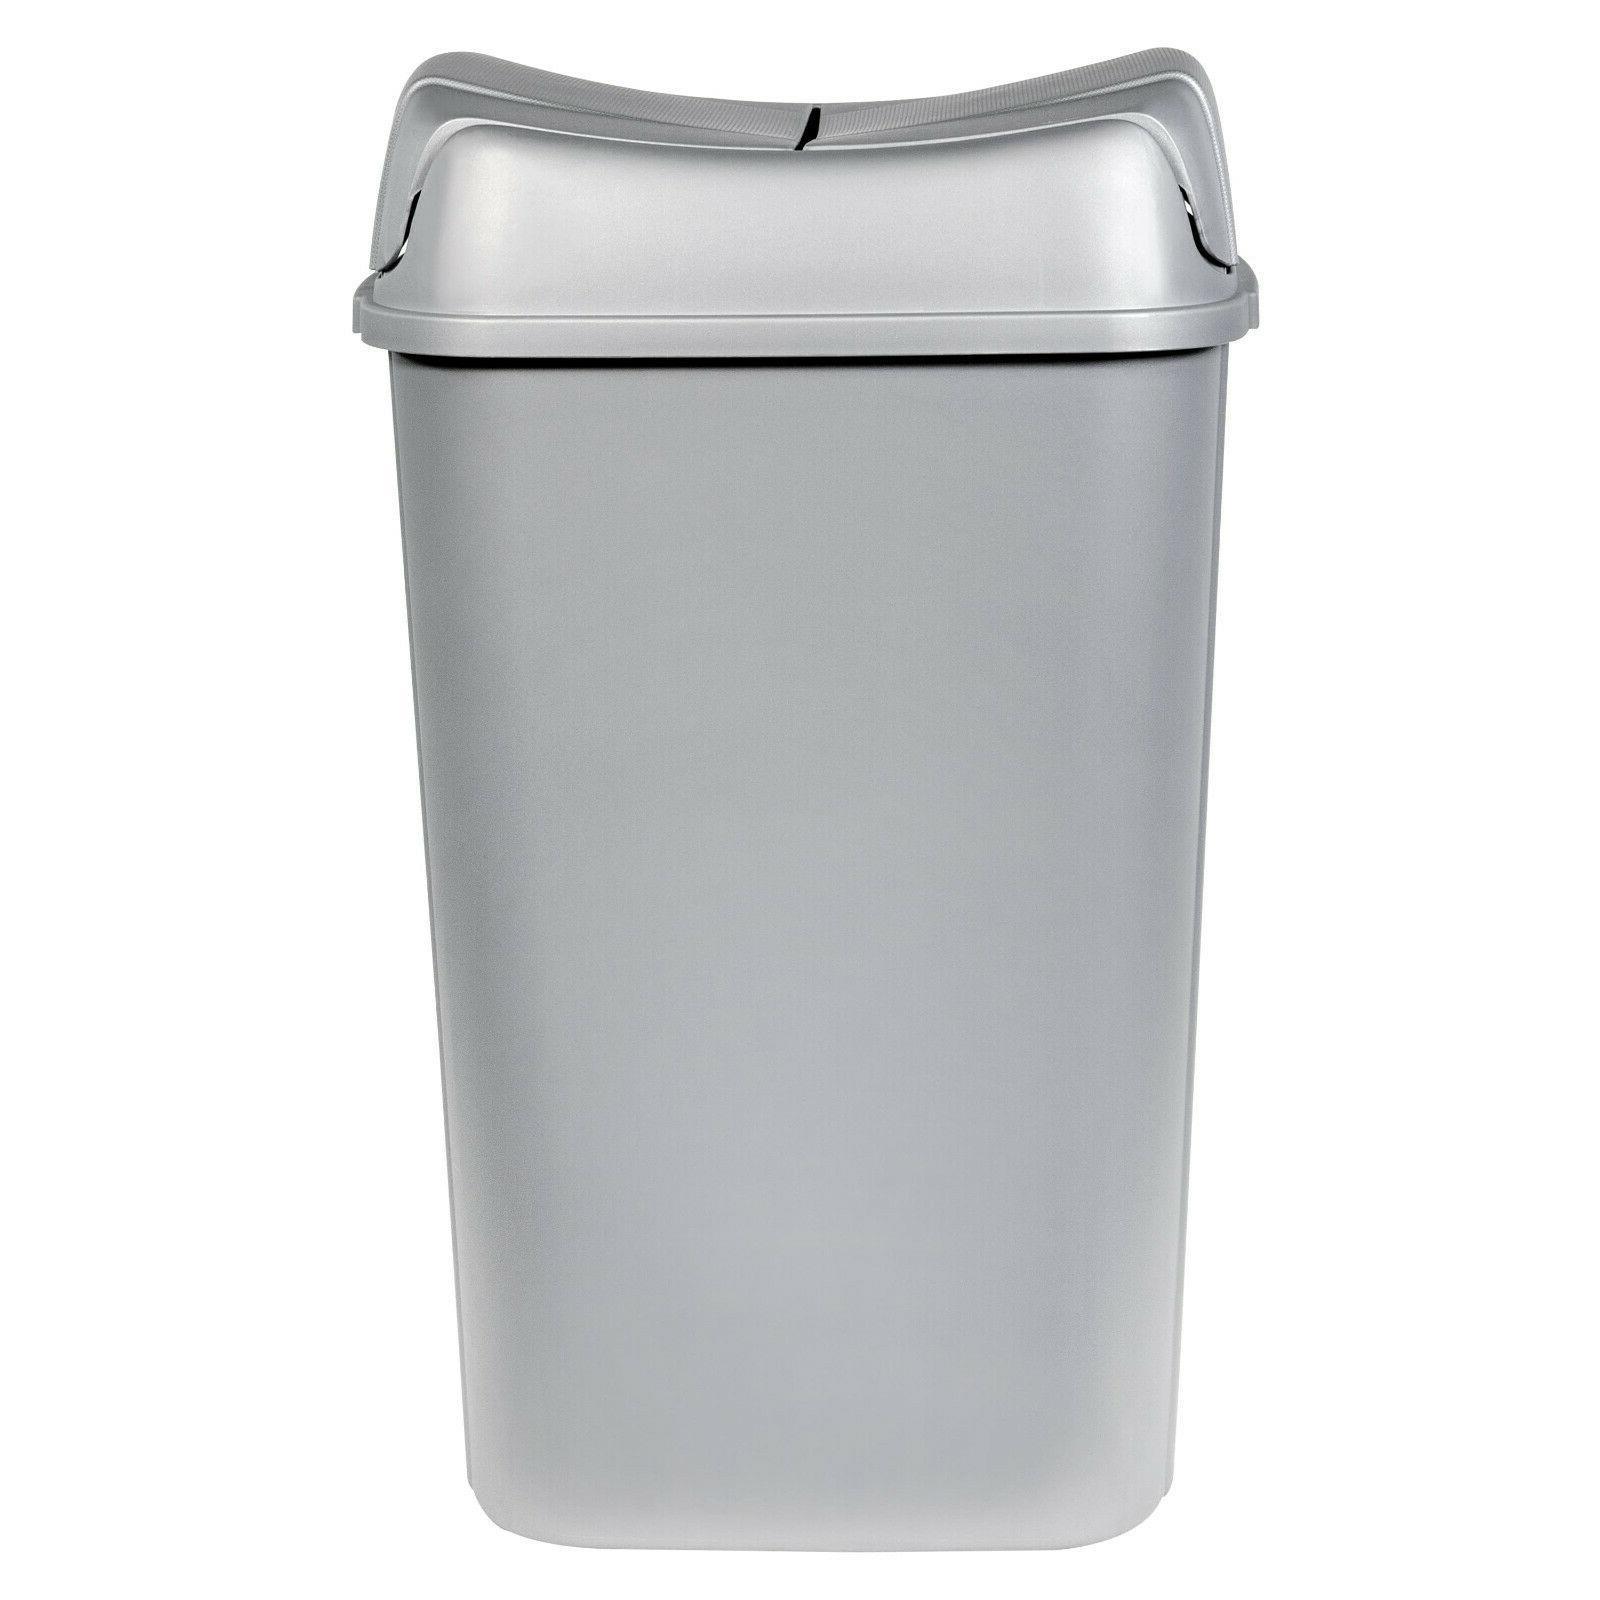 13 3 gallon pivot lid trash can